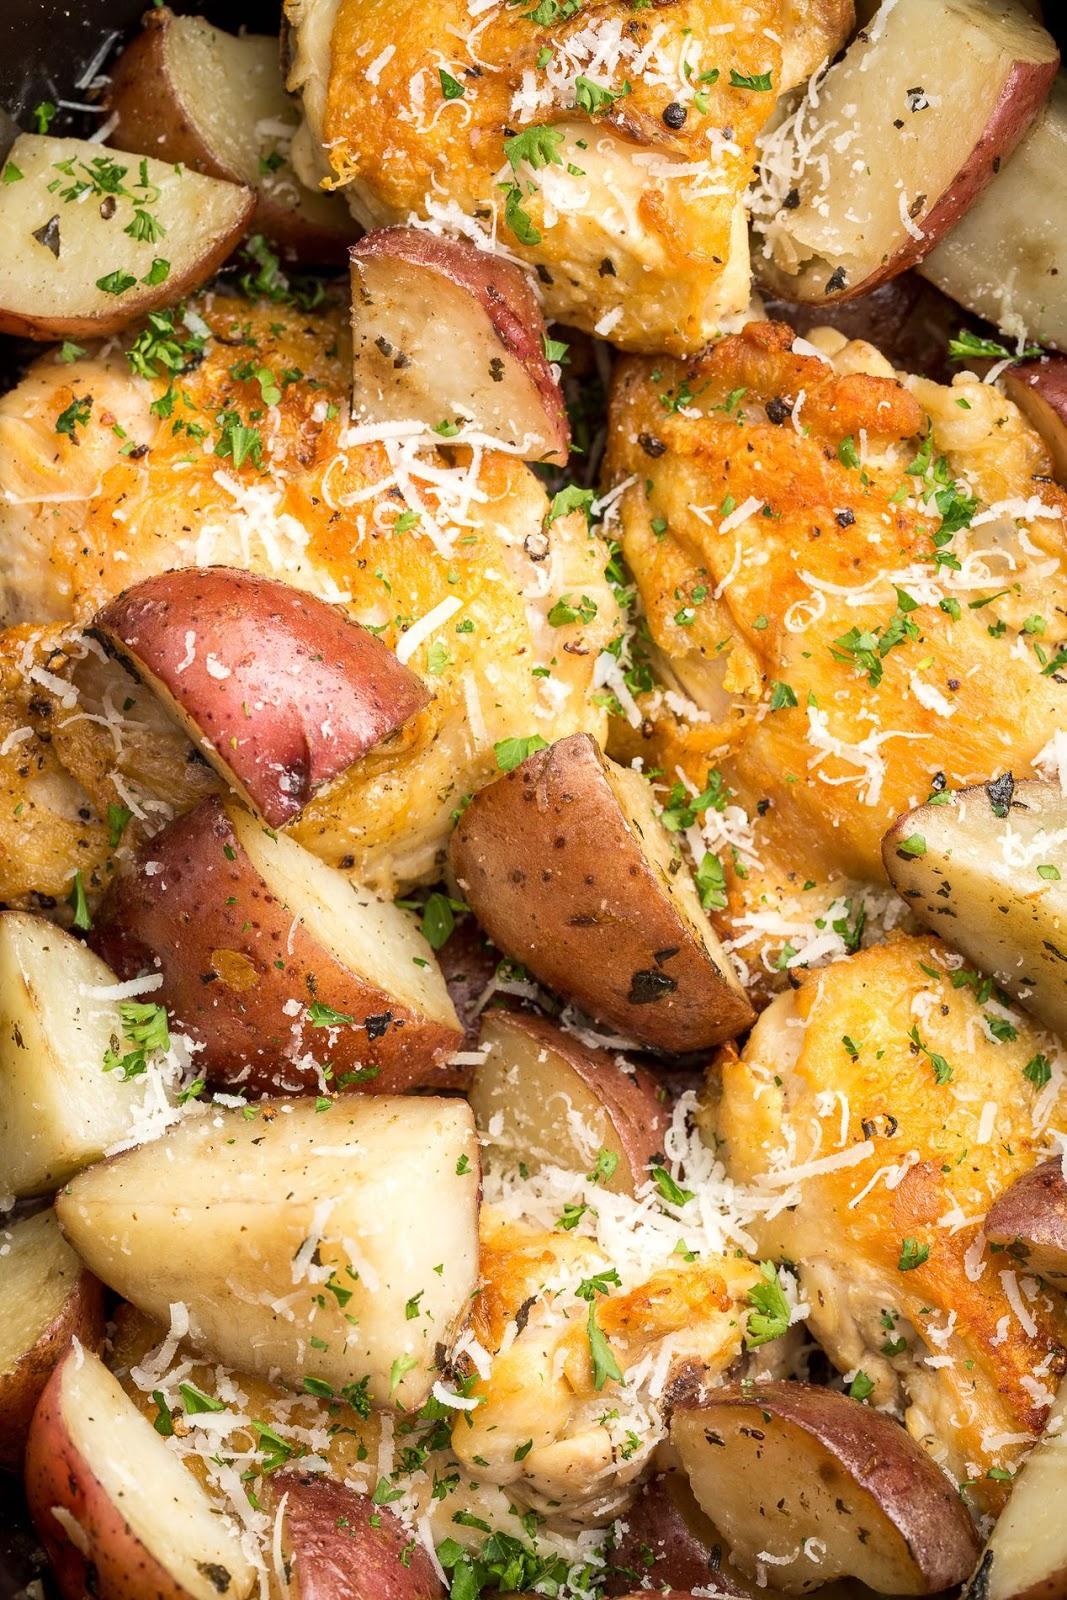 Incredible Slow Cooker Garlic Parmesan Chicken